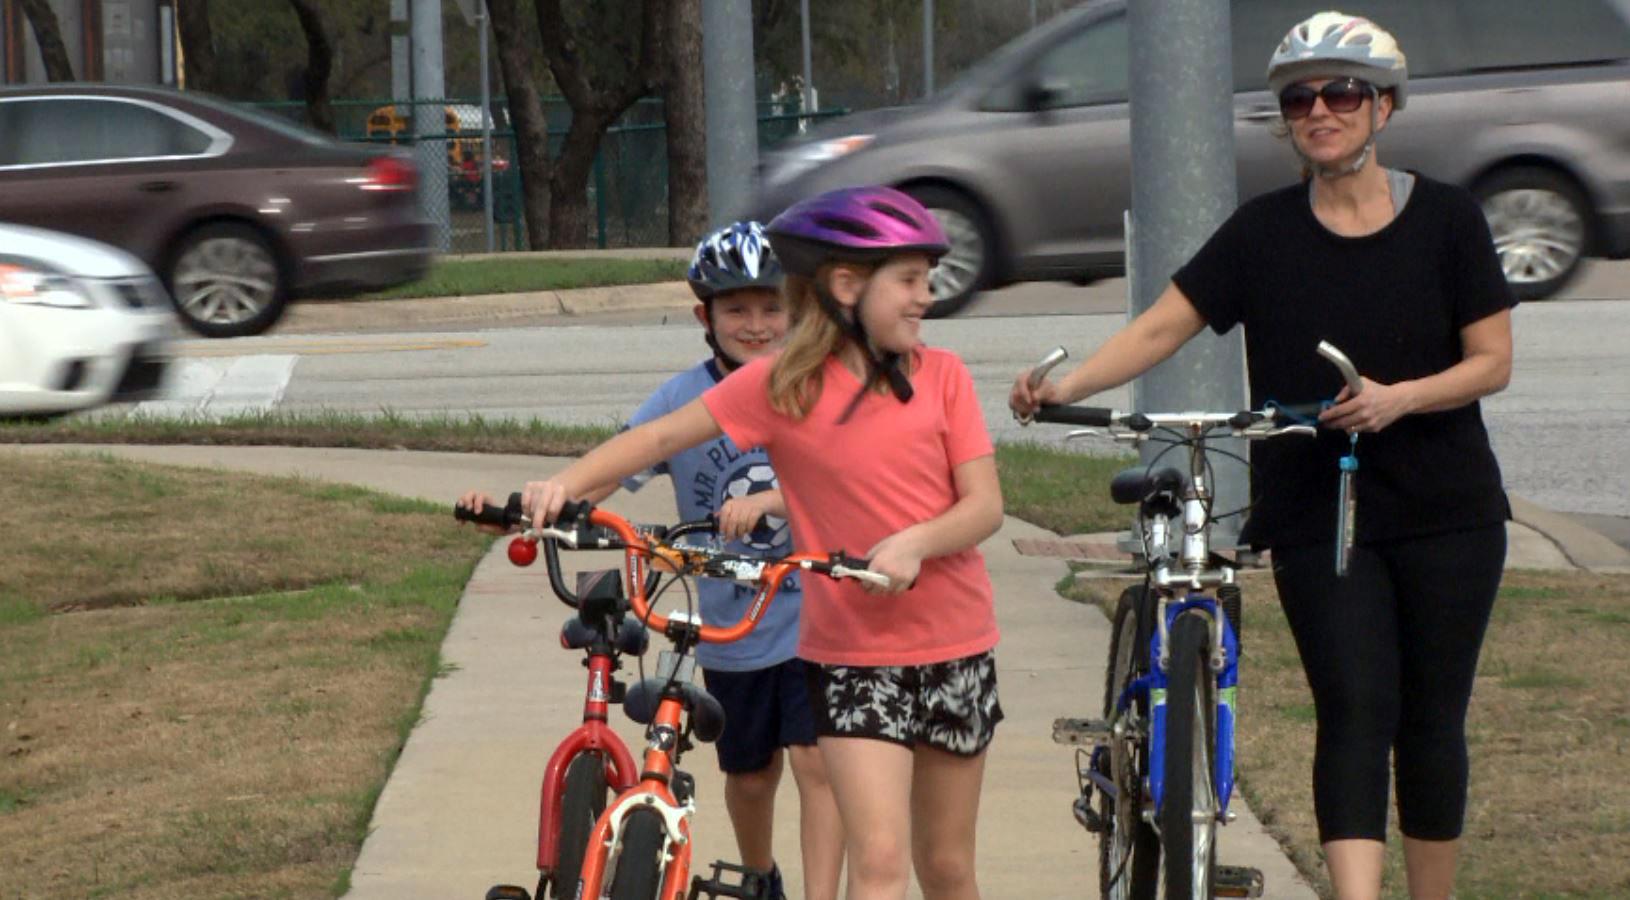 cedar park family biking_646690